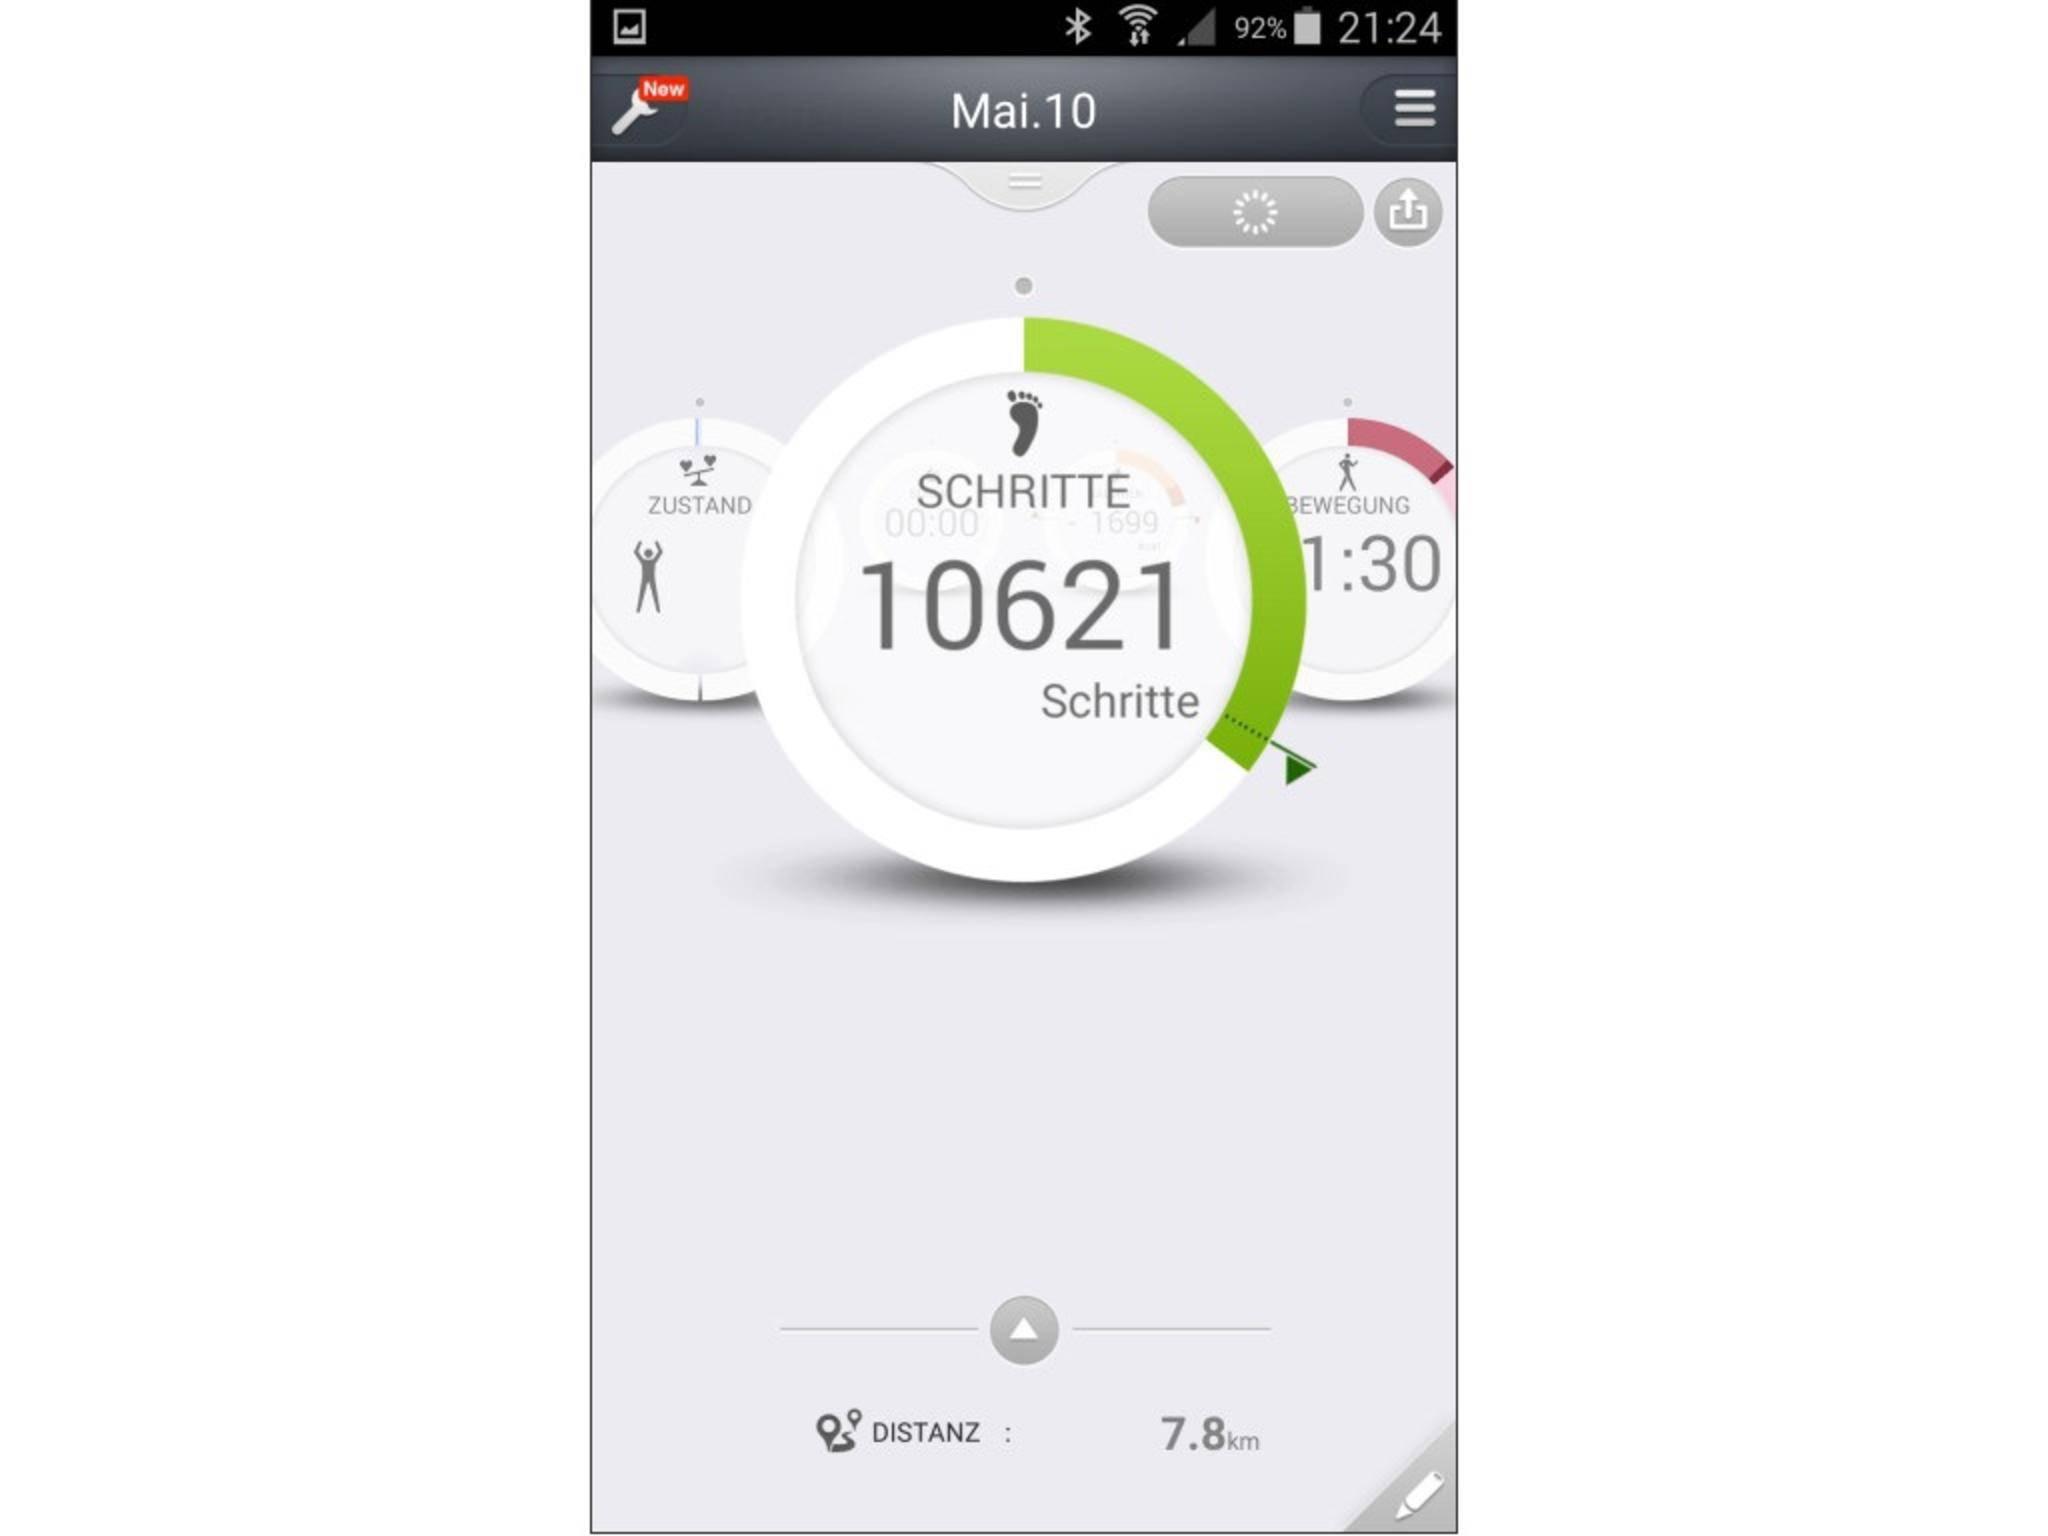 Epson Pulsense View App 1